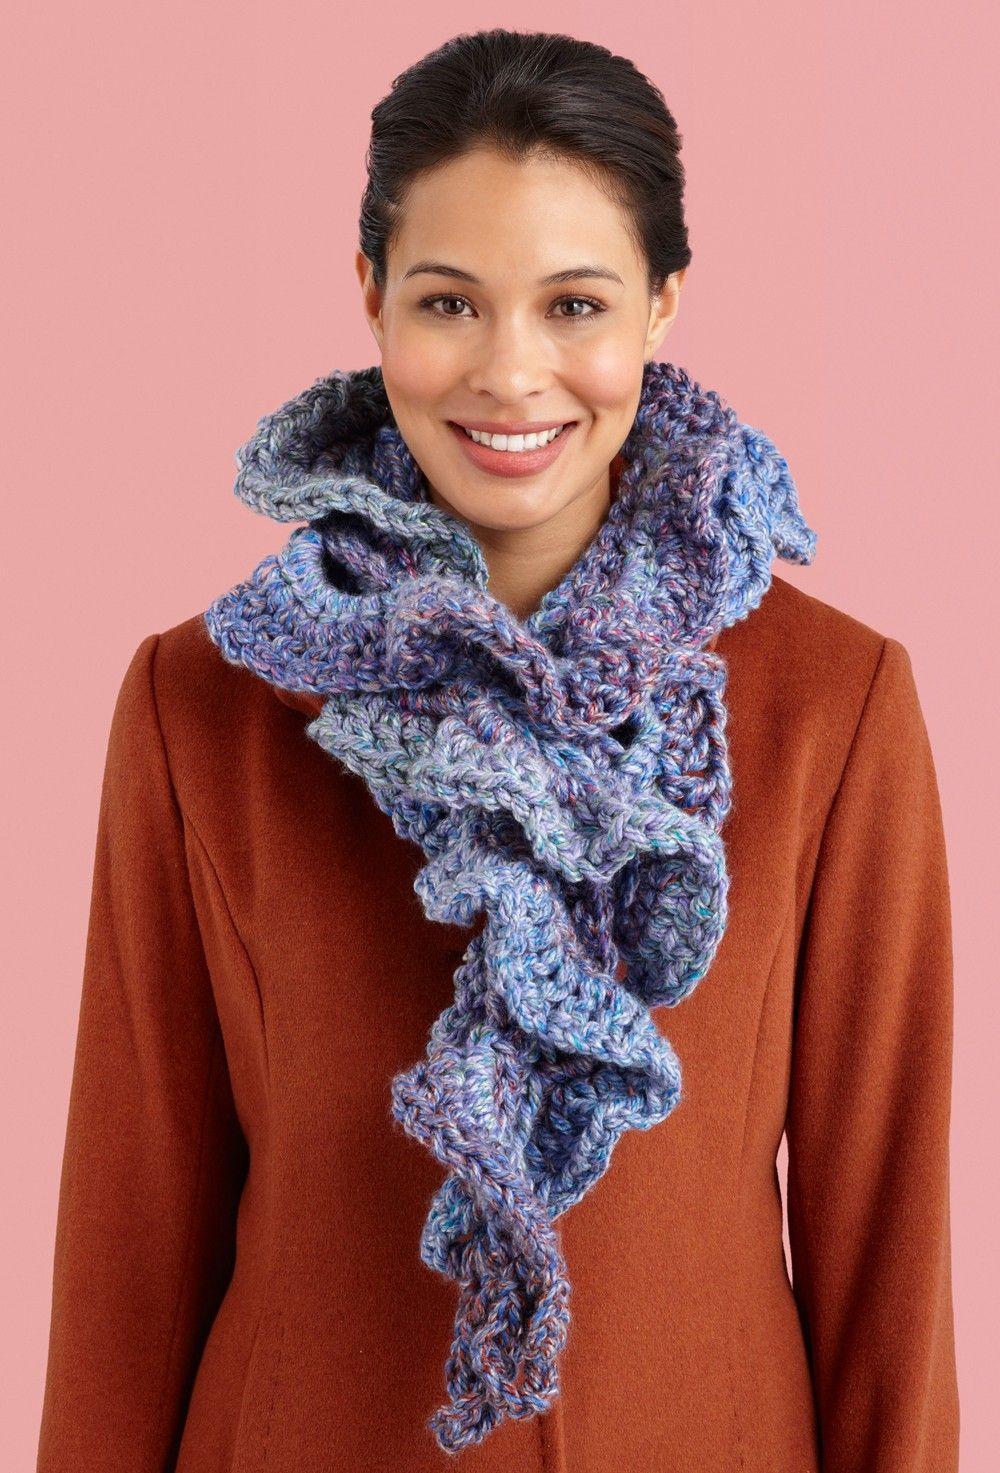 Ruffled Scarf Pattern (Crochet) - Patterns - Lion Brand Yarn   ch ...